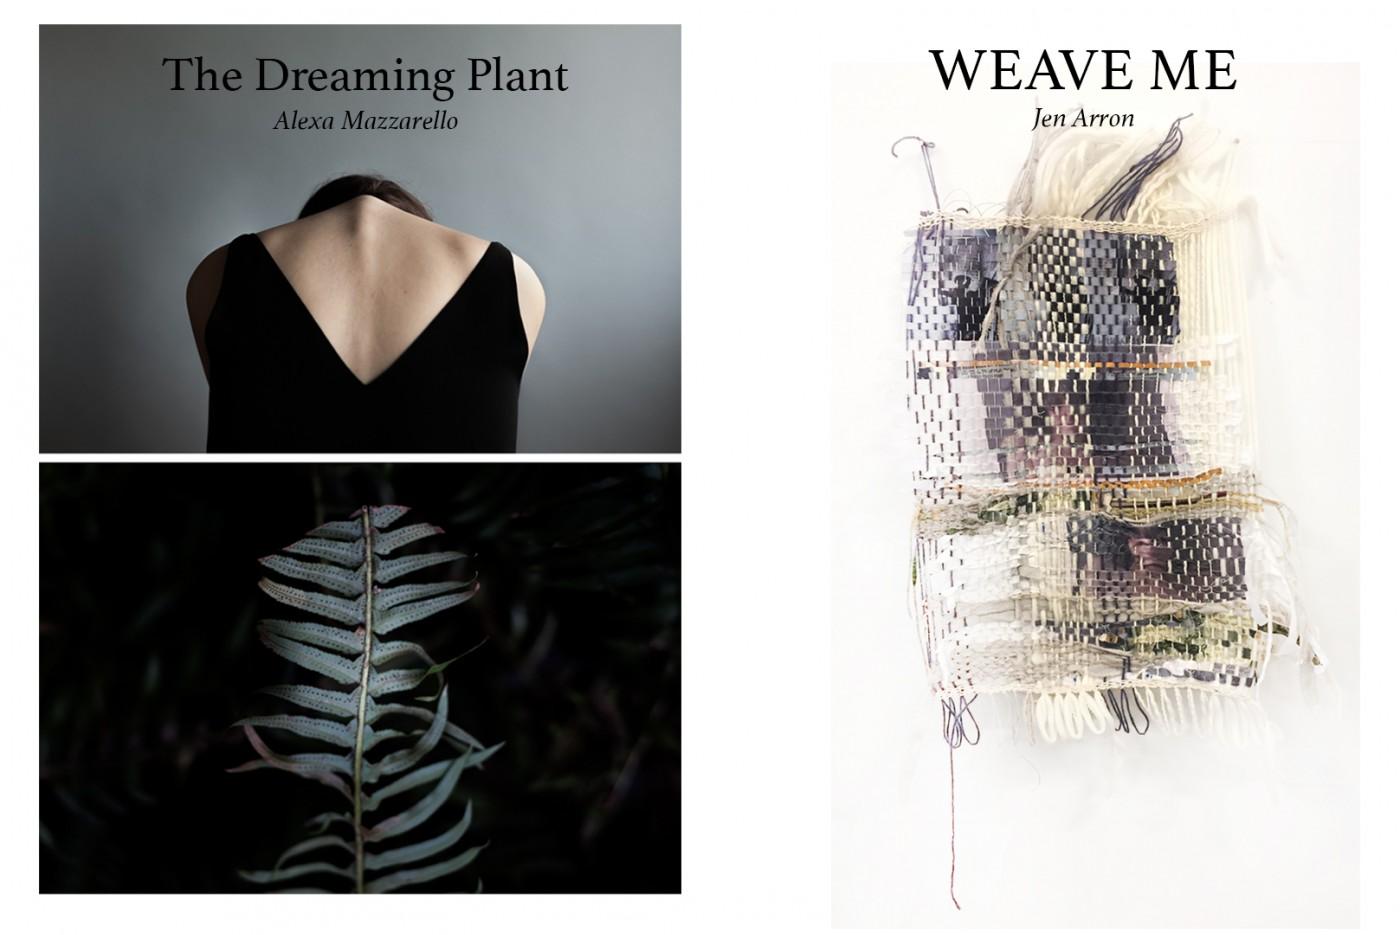 Alexa Mazzarello and Jen Arron, </span><span><em>THE DREAMING PLANT x WEAVE ME</em>